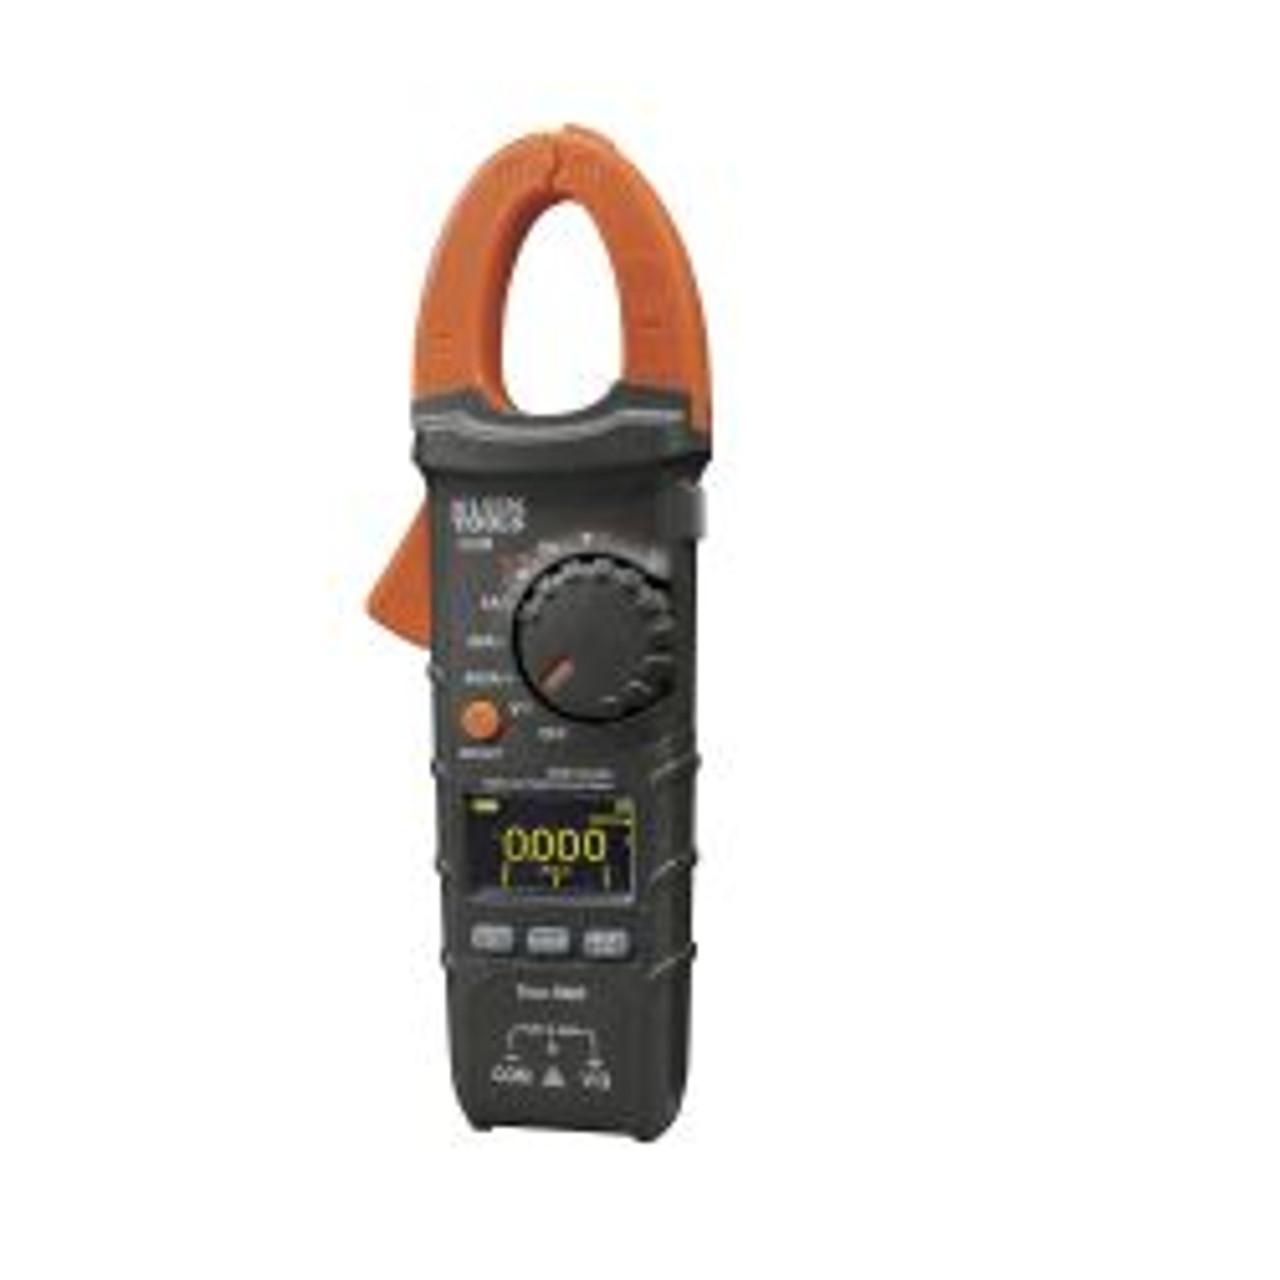 Klein CL330 Auto-Ranging Digital Clamp Meter